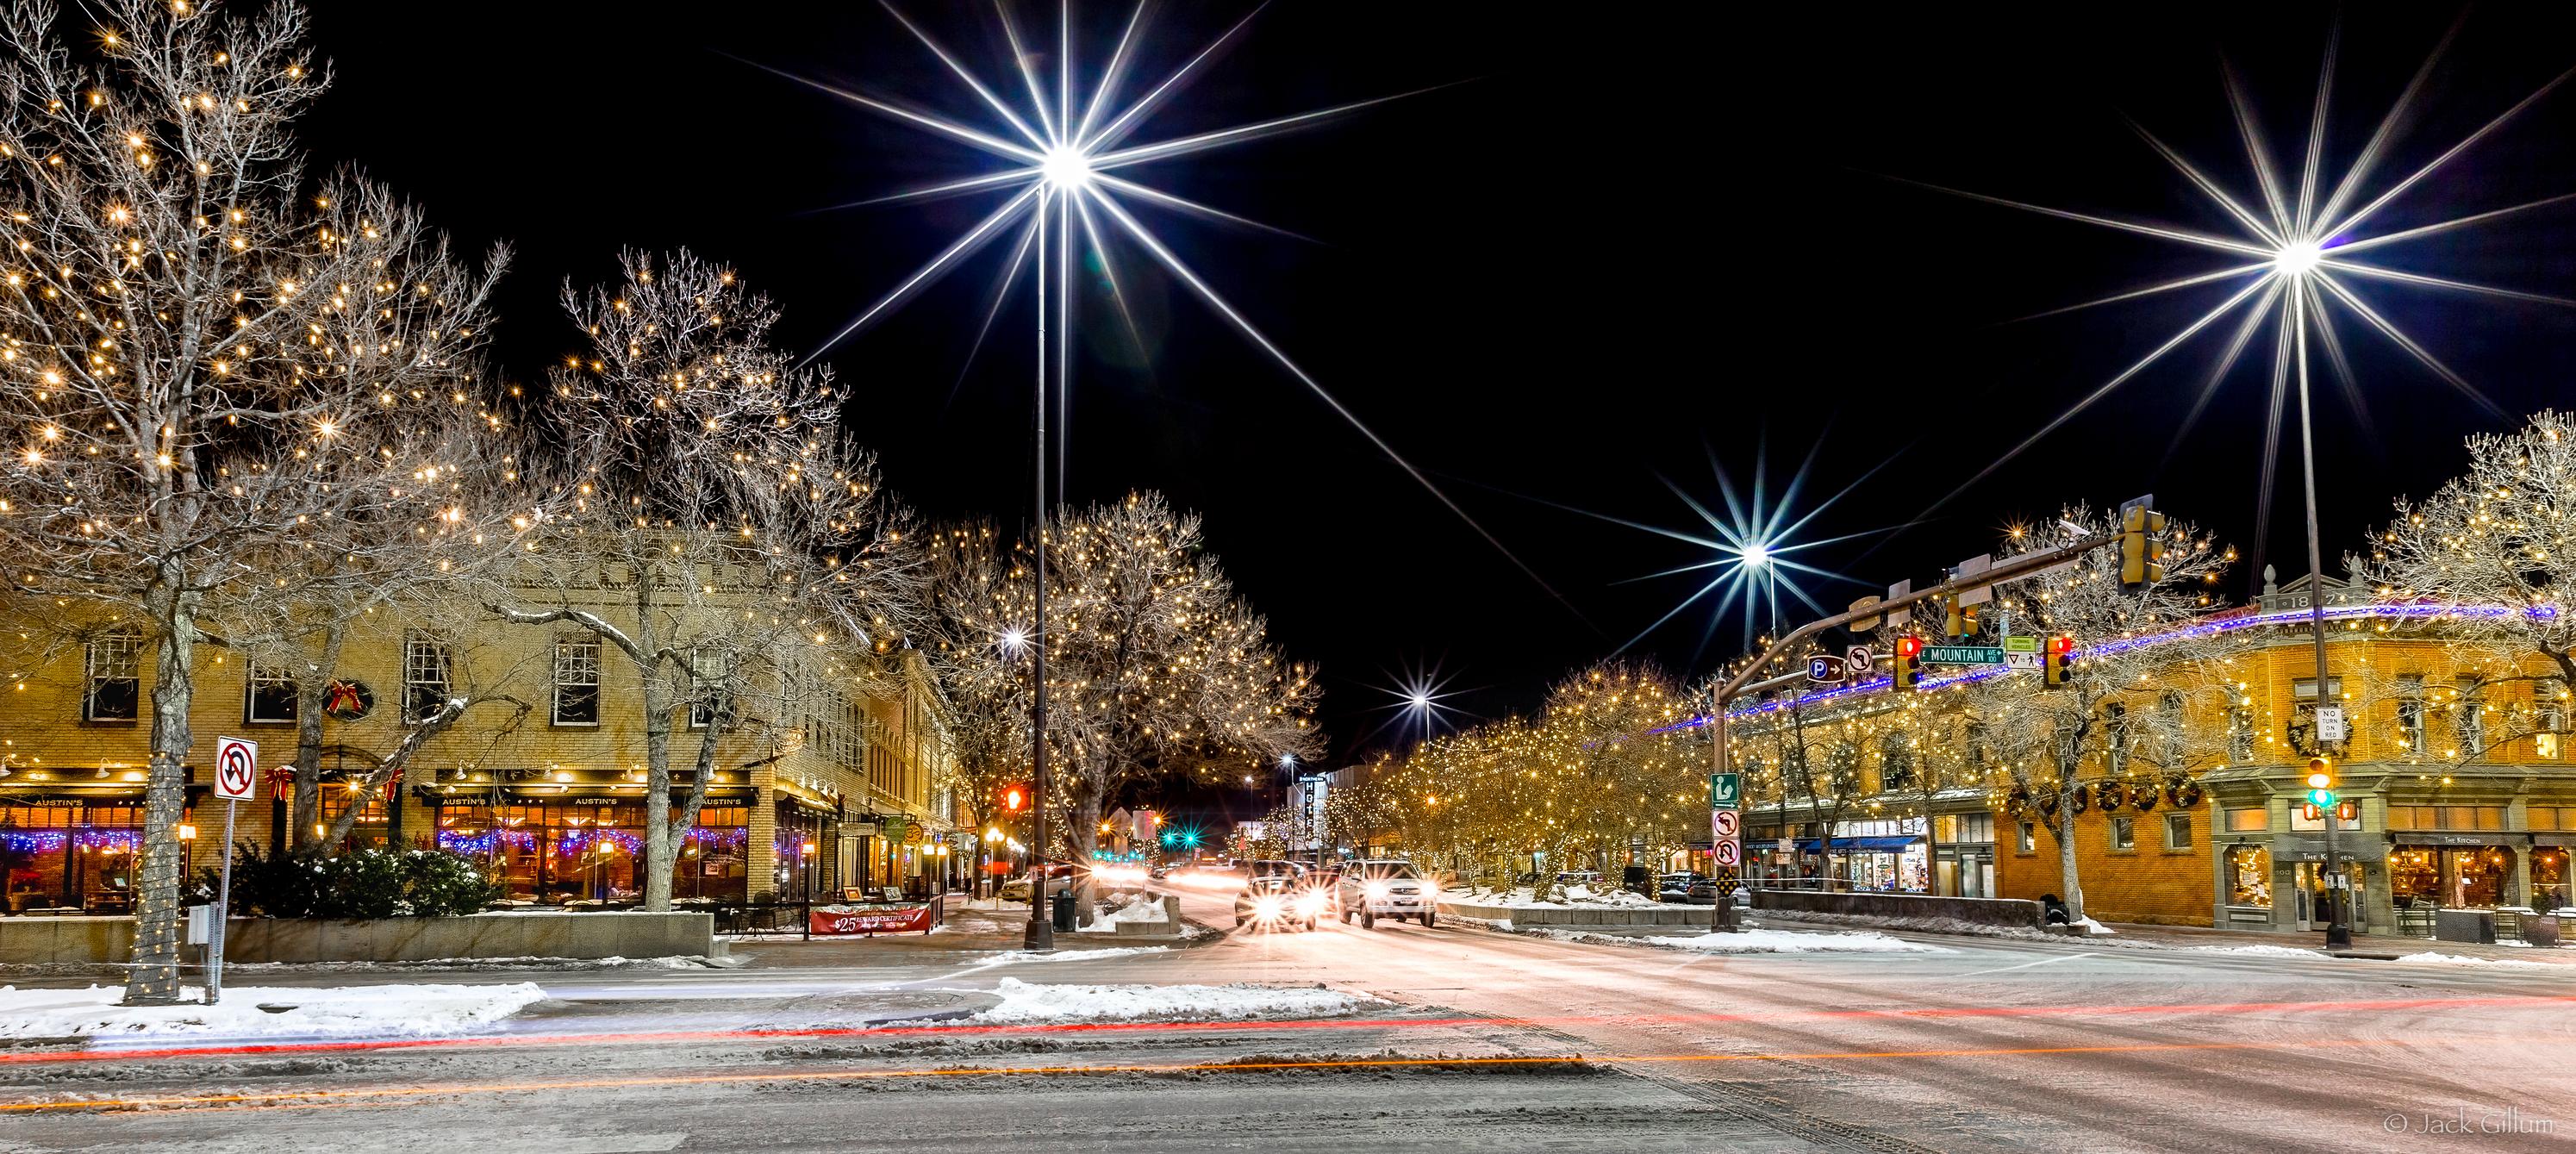 Fort Collins Christmas Events 2020 Fort Collins in Lights | Visit Fort Collins